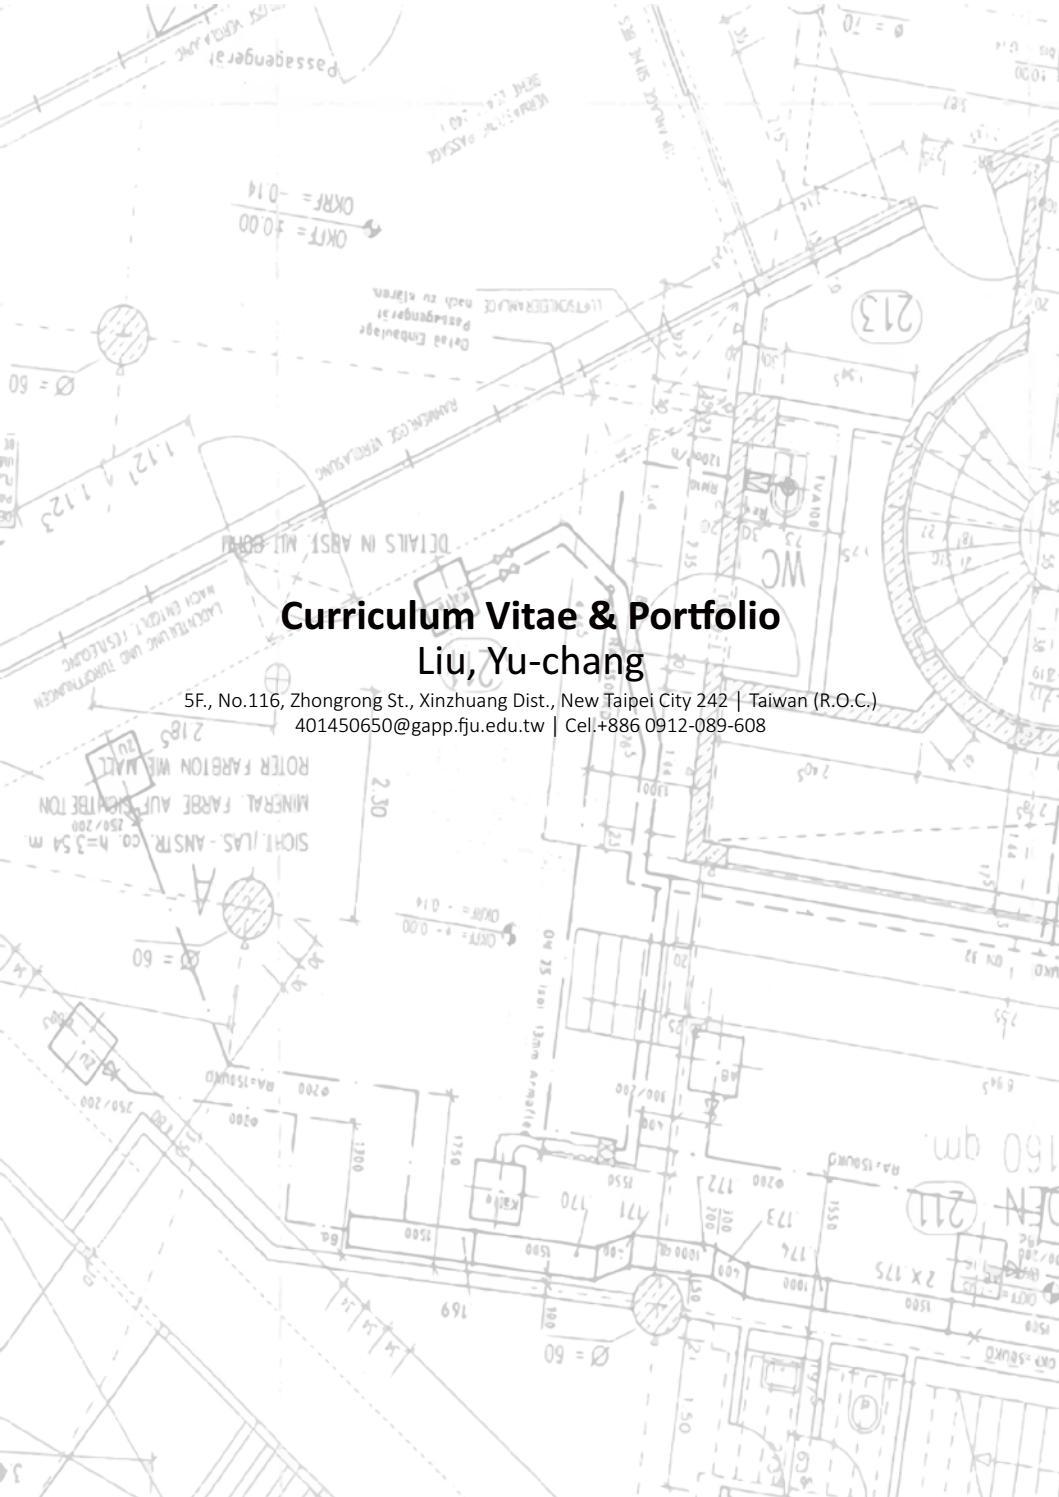 landscape architecture Curriculum vitae & portfolio by Yu